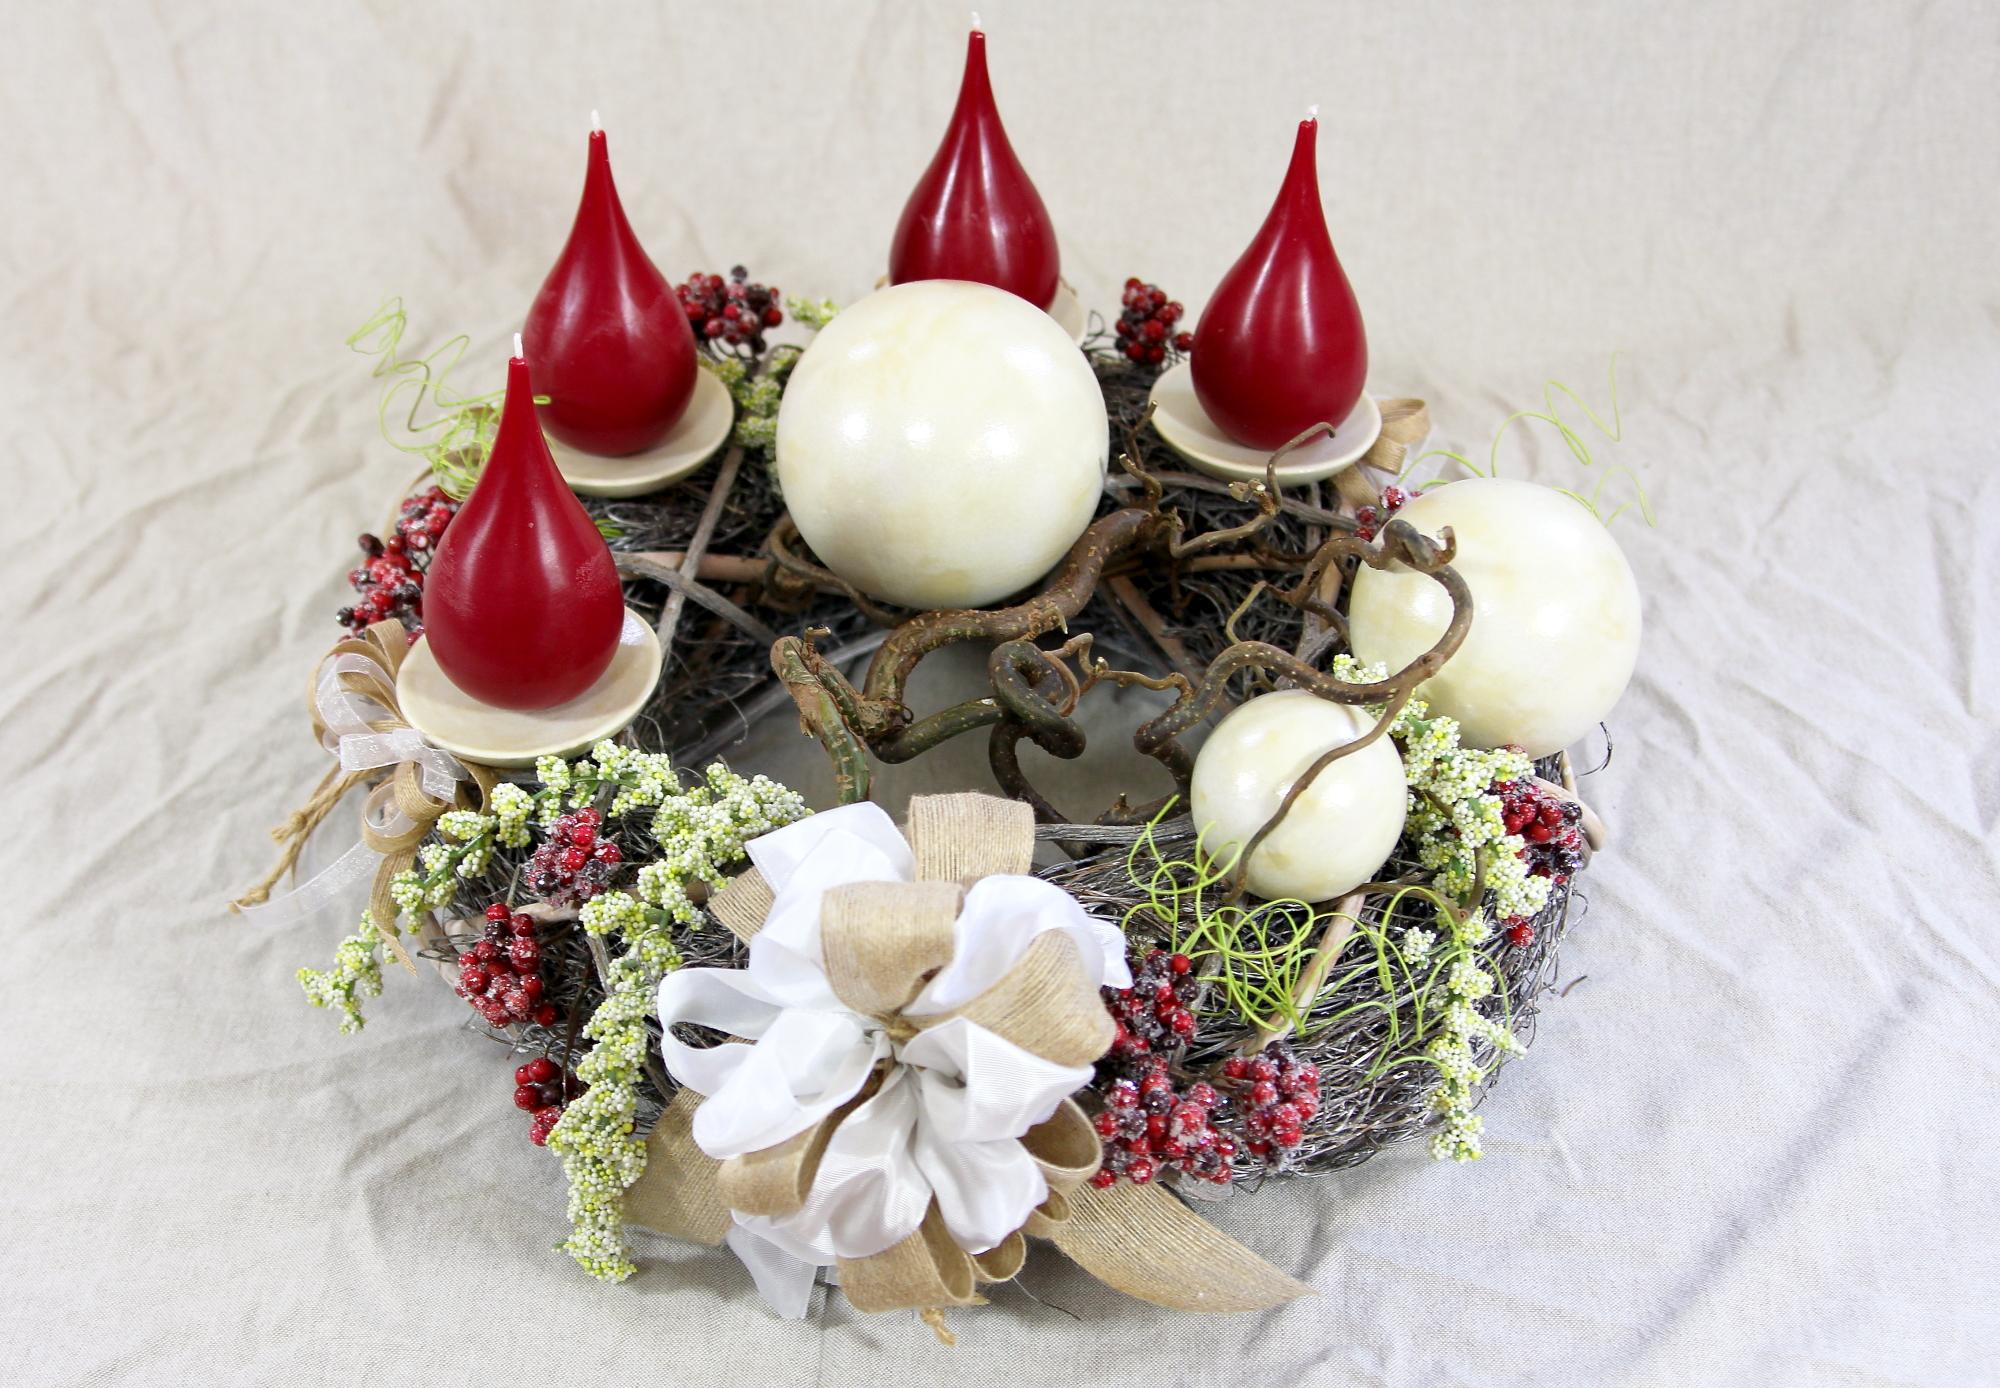 Adventskränze, Weihnachtskränze